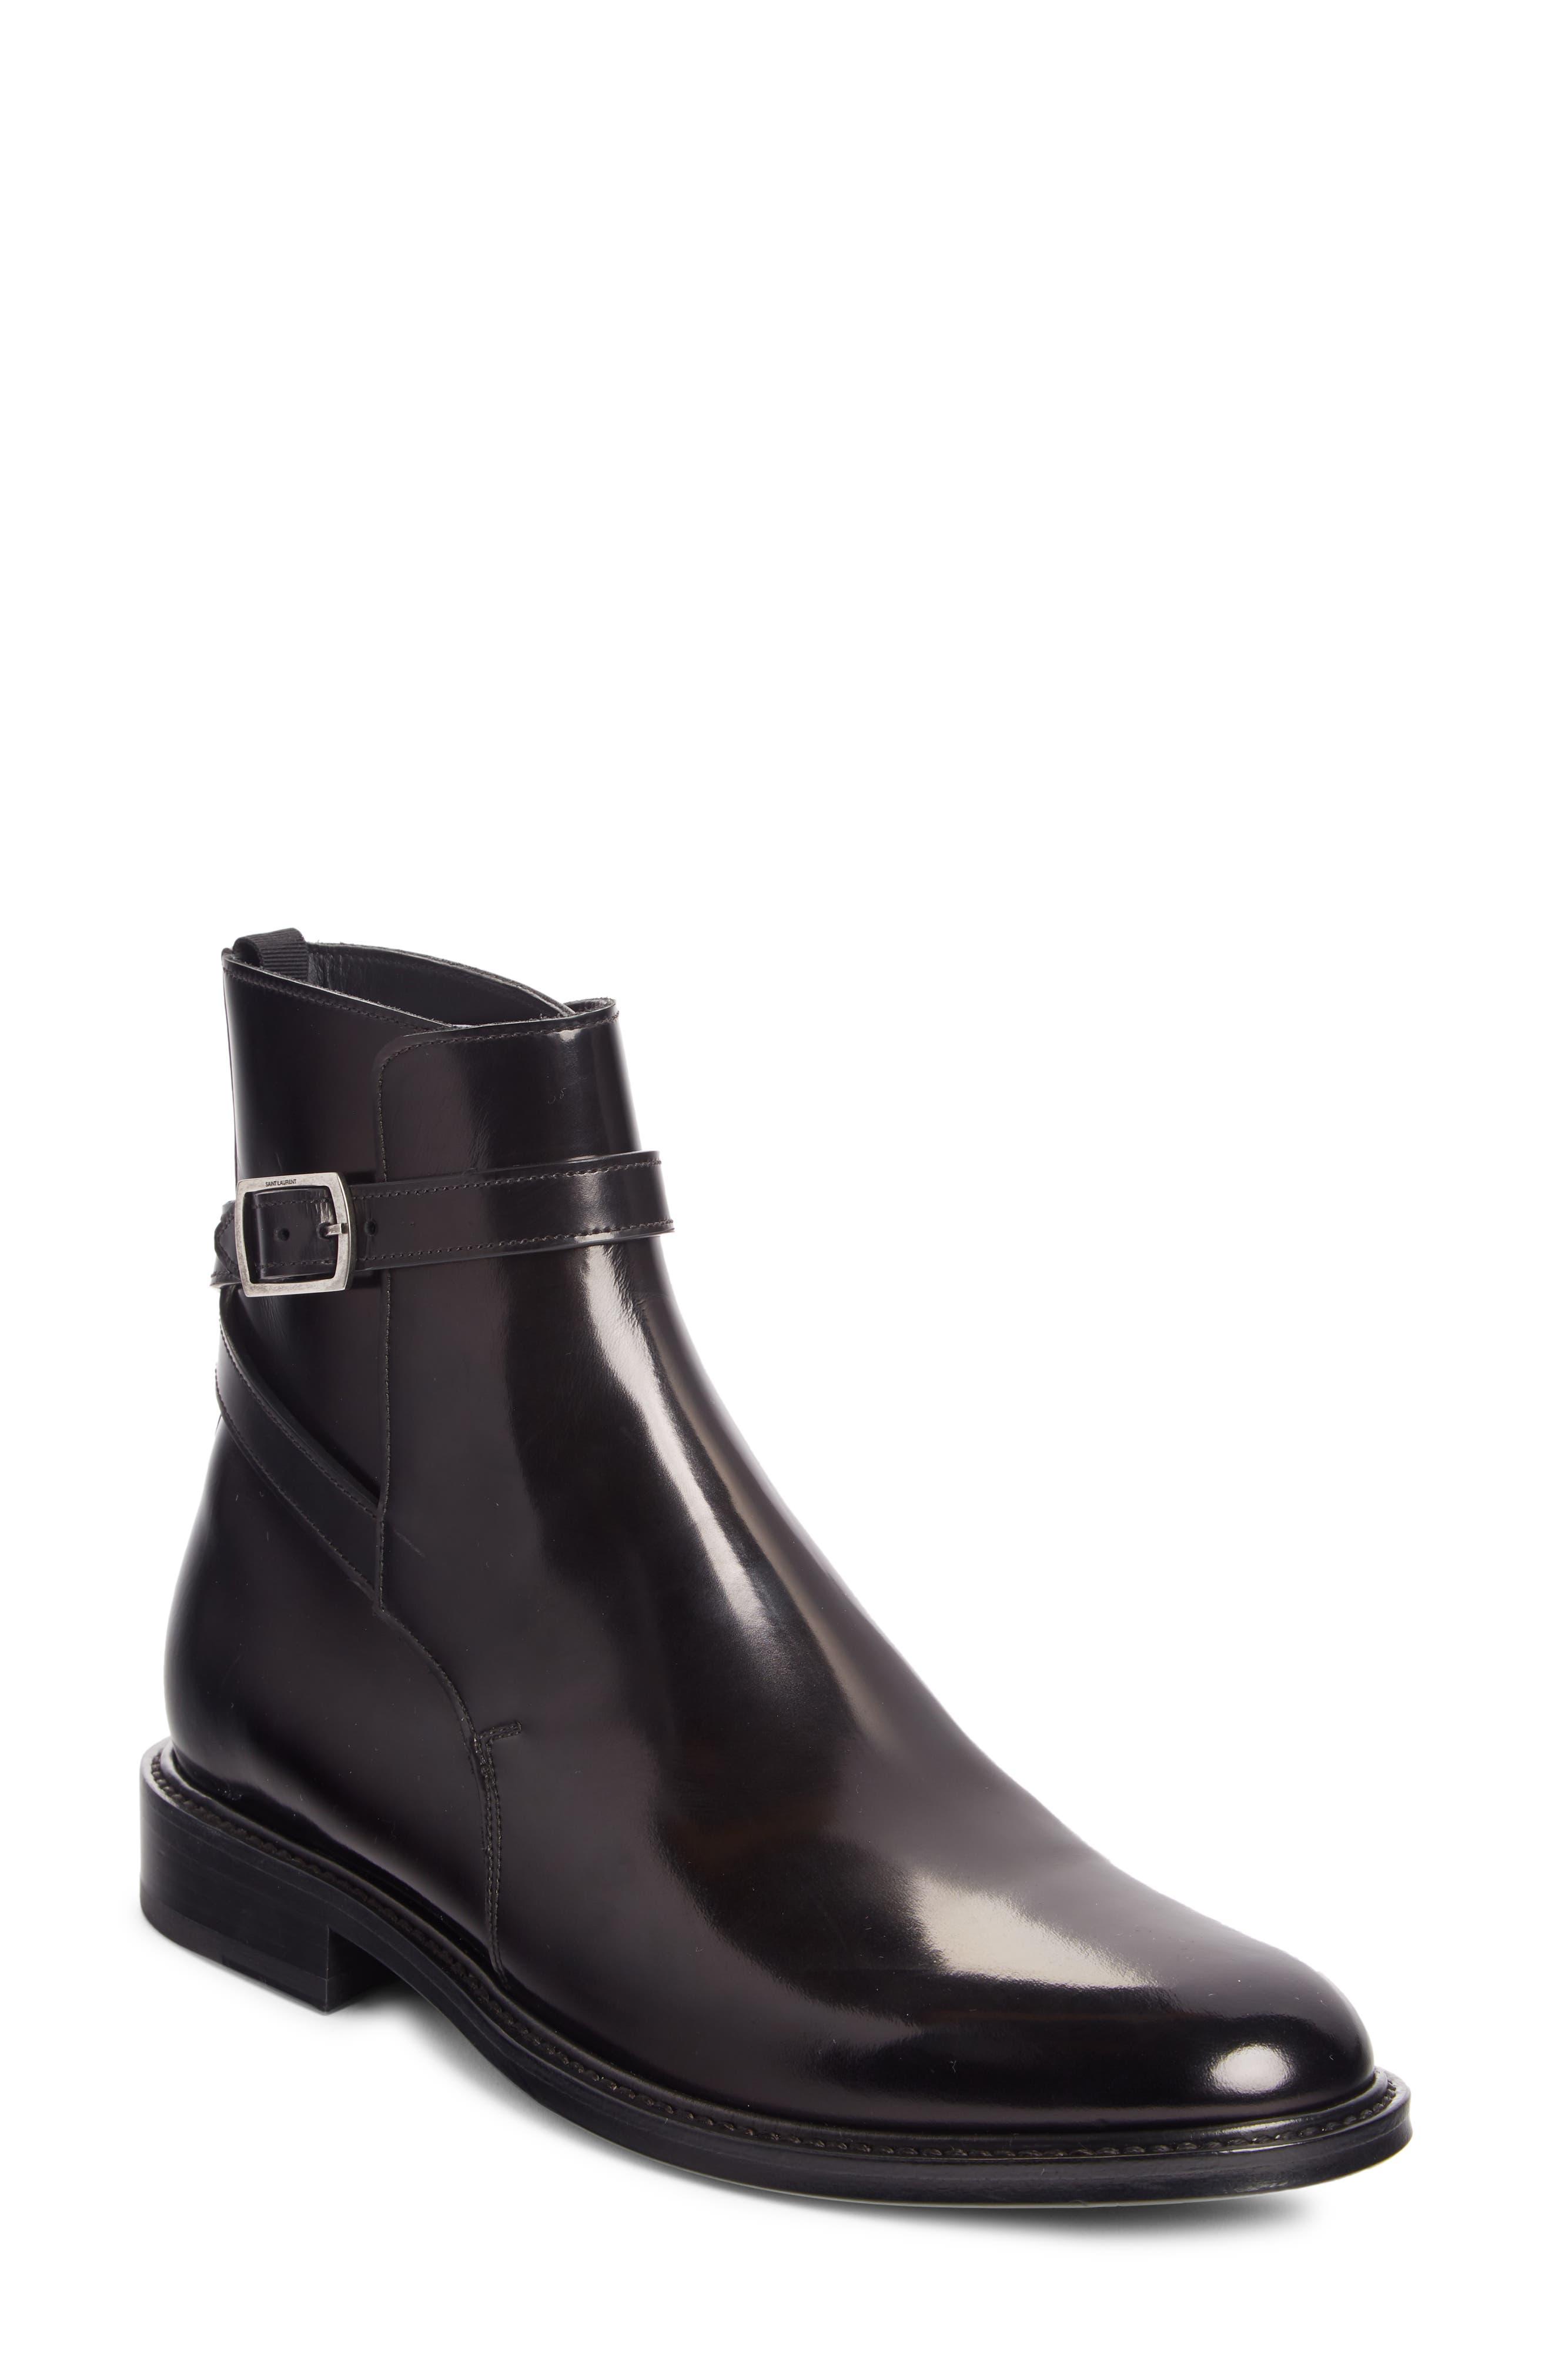 designer shoe boots